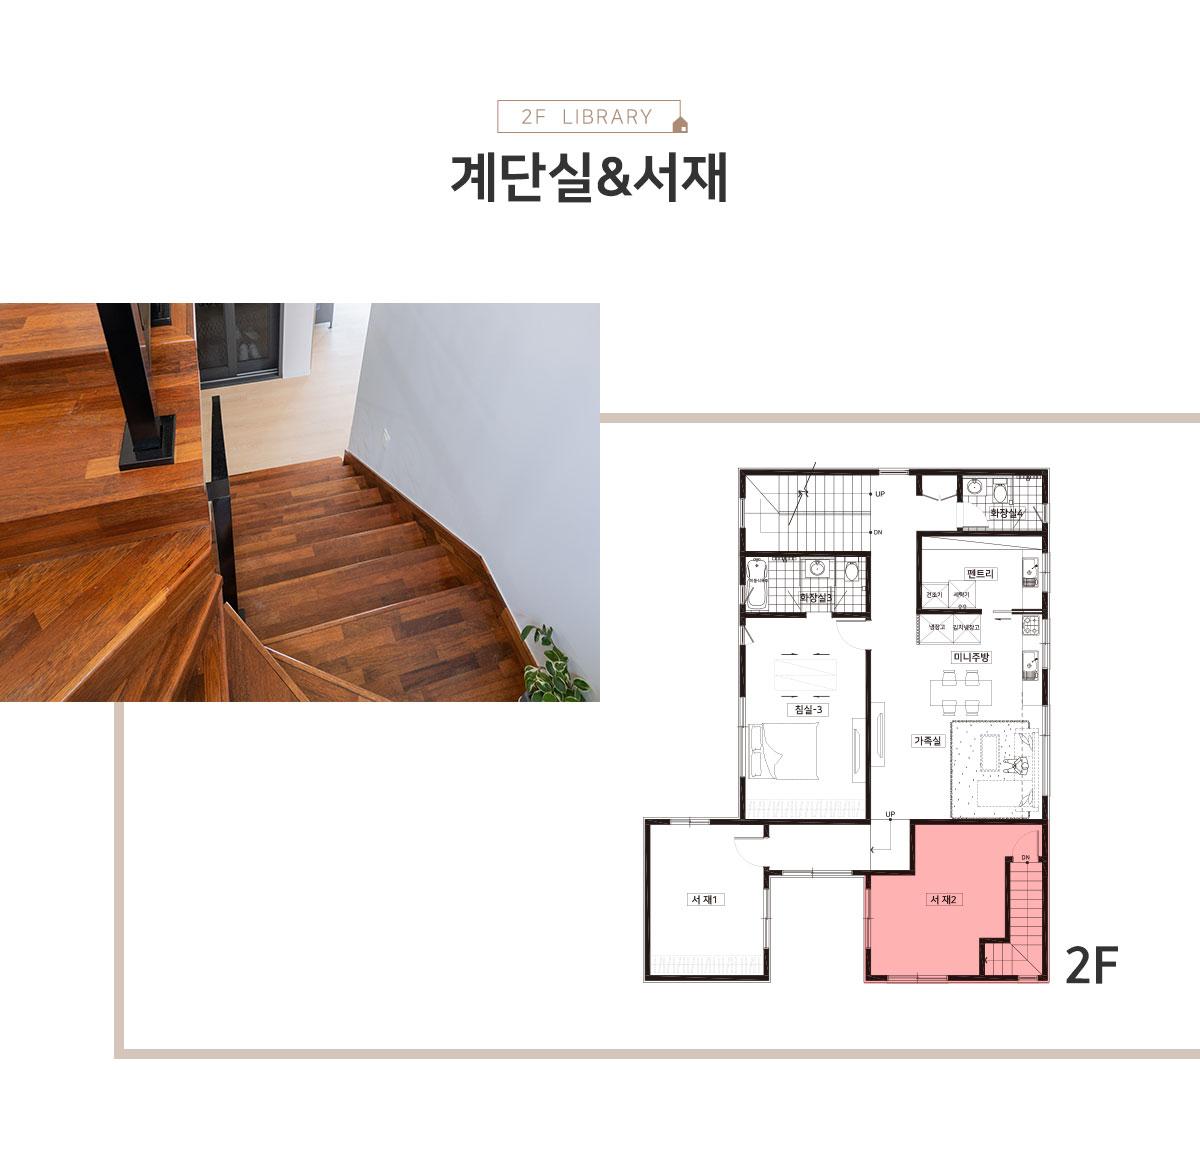 006_room_경기-용인-기흥구-중동_이문식_01.jpg